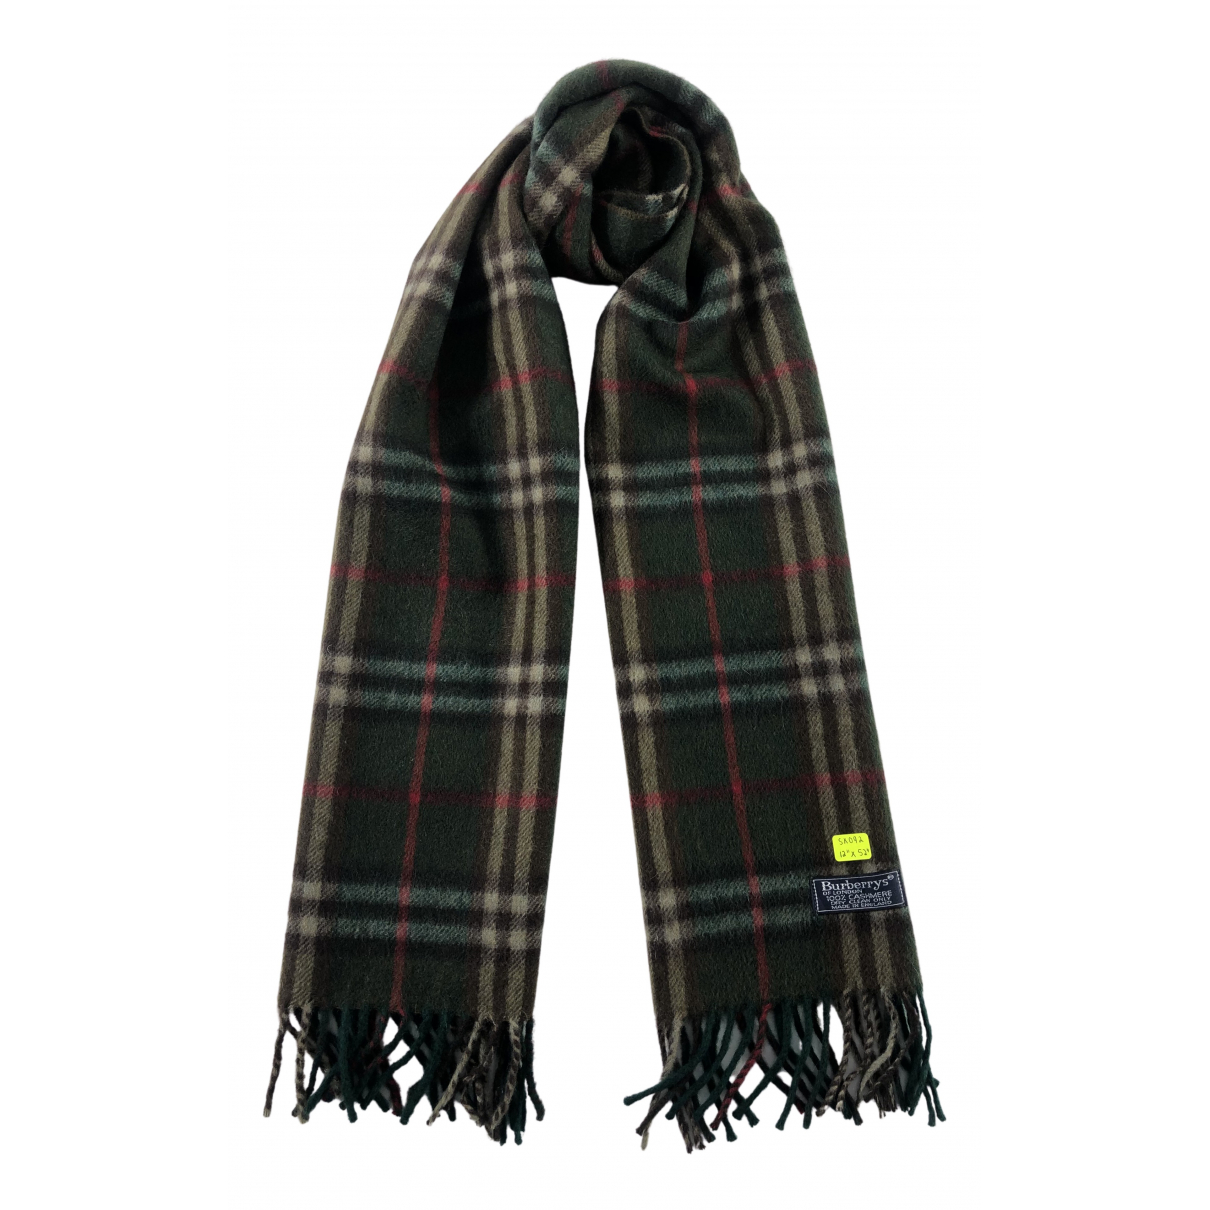 Burberry N Green Cashmere scarf & pocket squares for Men N